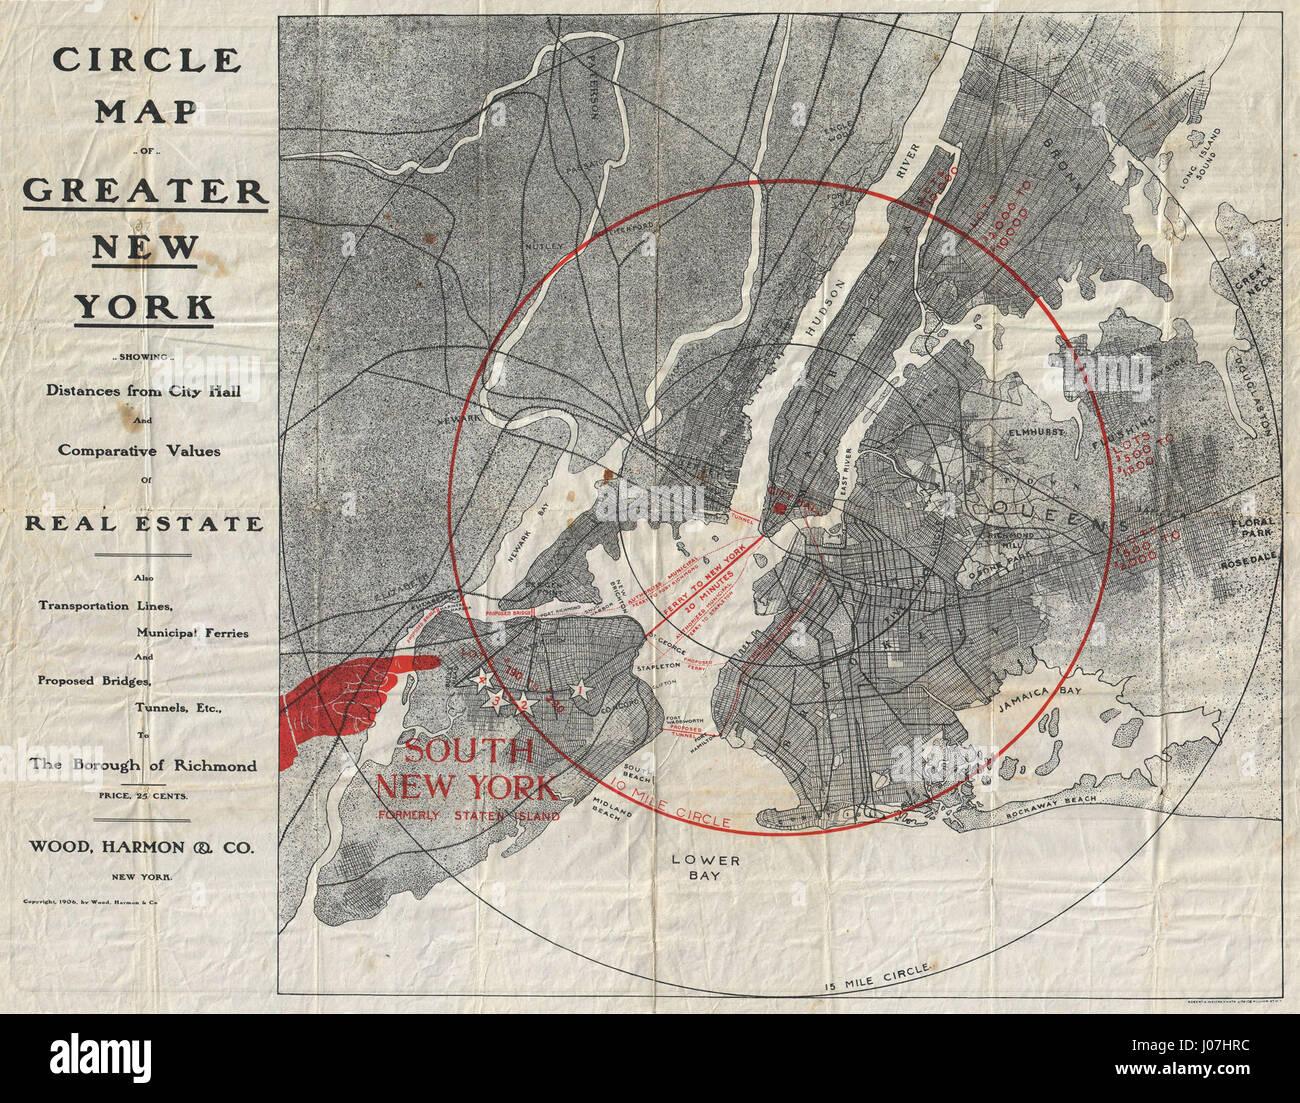 Brooklyn Staten Island Car: 1906 Wood Harmon Map Of New York City (w- Staten Island